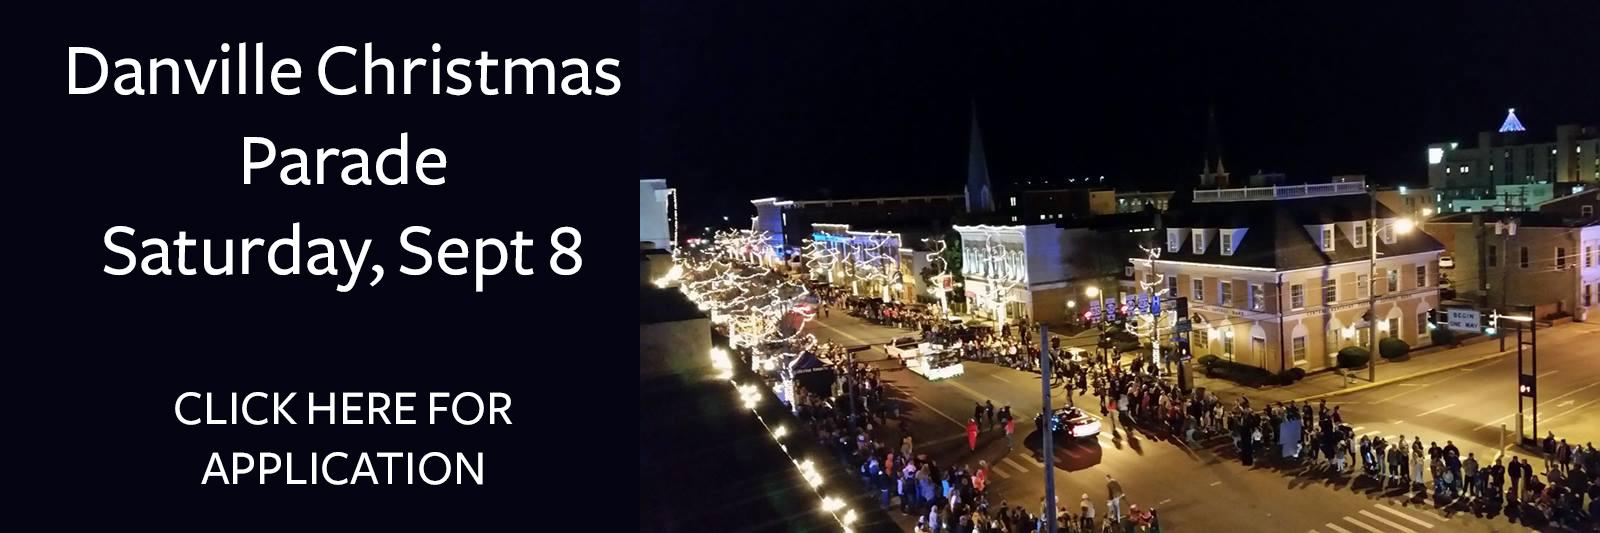 Christmas-parade-web-banner.jpg